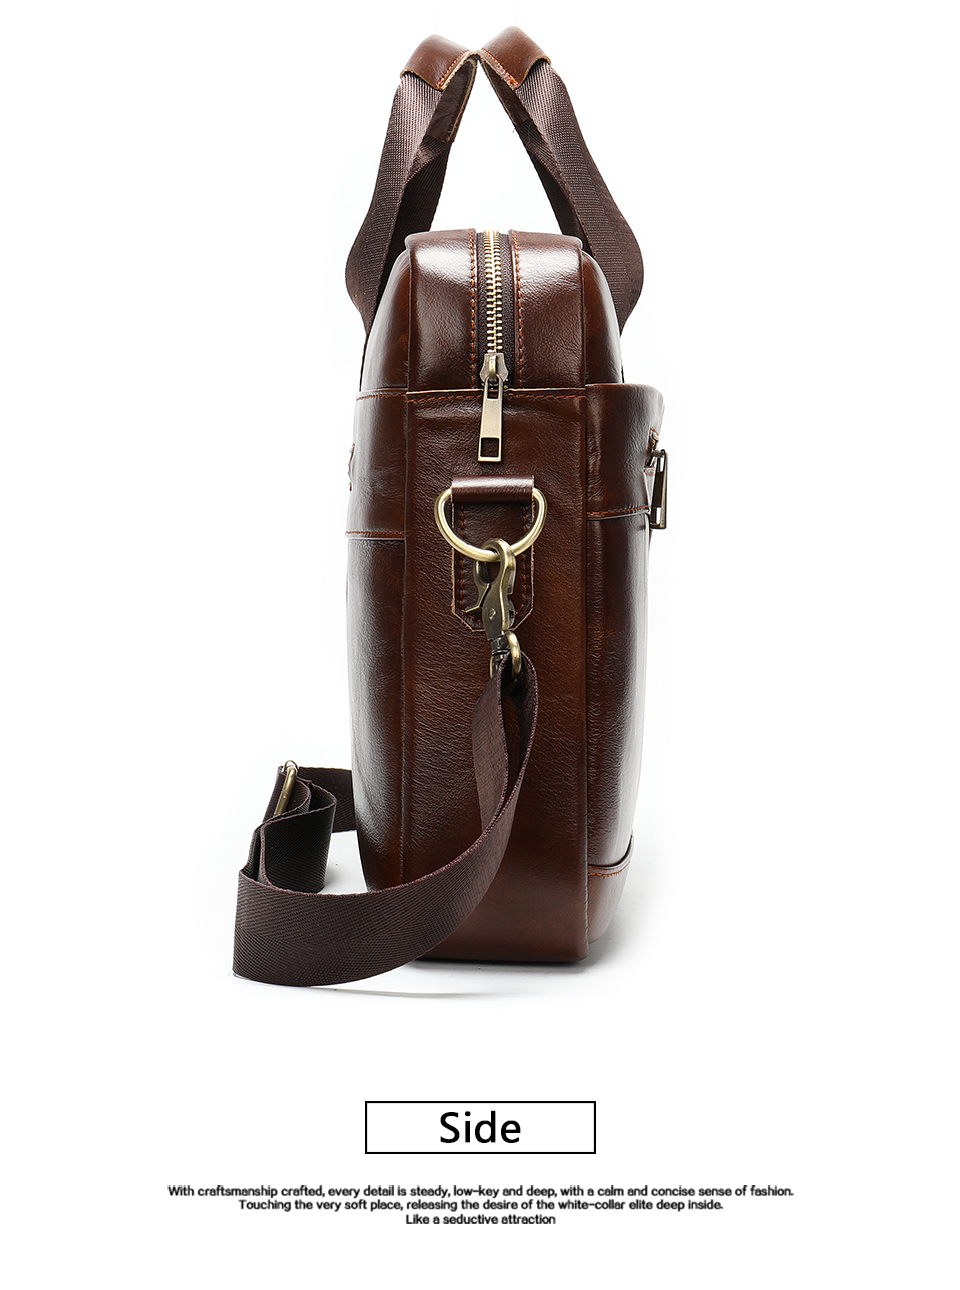 HTB18br XRGw3KVjSZFwq6zQ2FXaL WESTAL Men's Briefcase Men's Bag Genuine Leather Laptop Bag Leather Computer/Office Bags for Men Document Briefcases Totes Bags